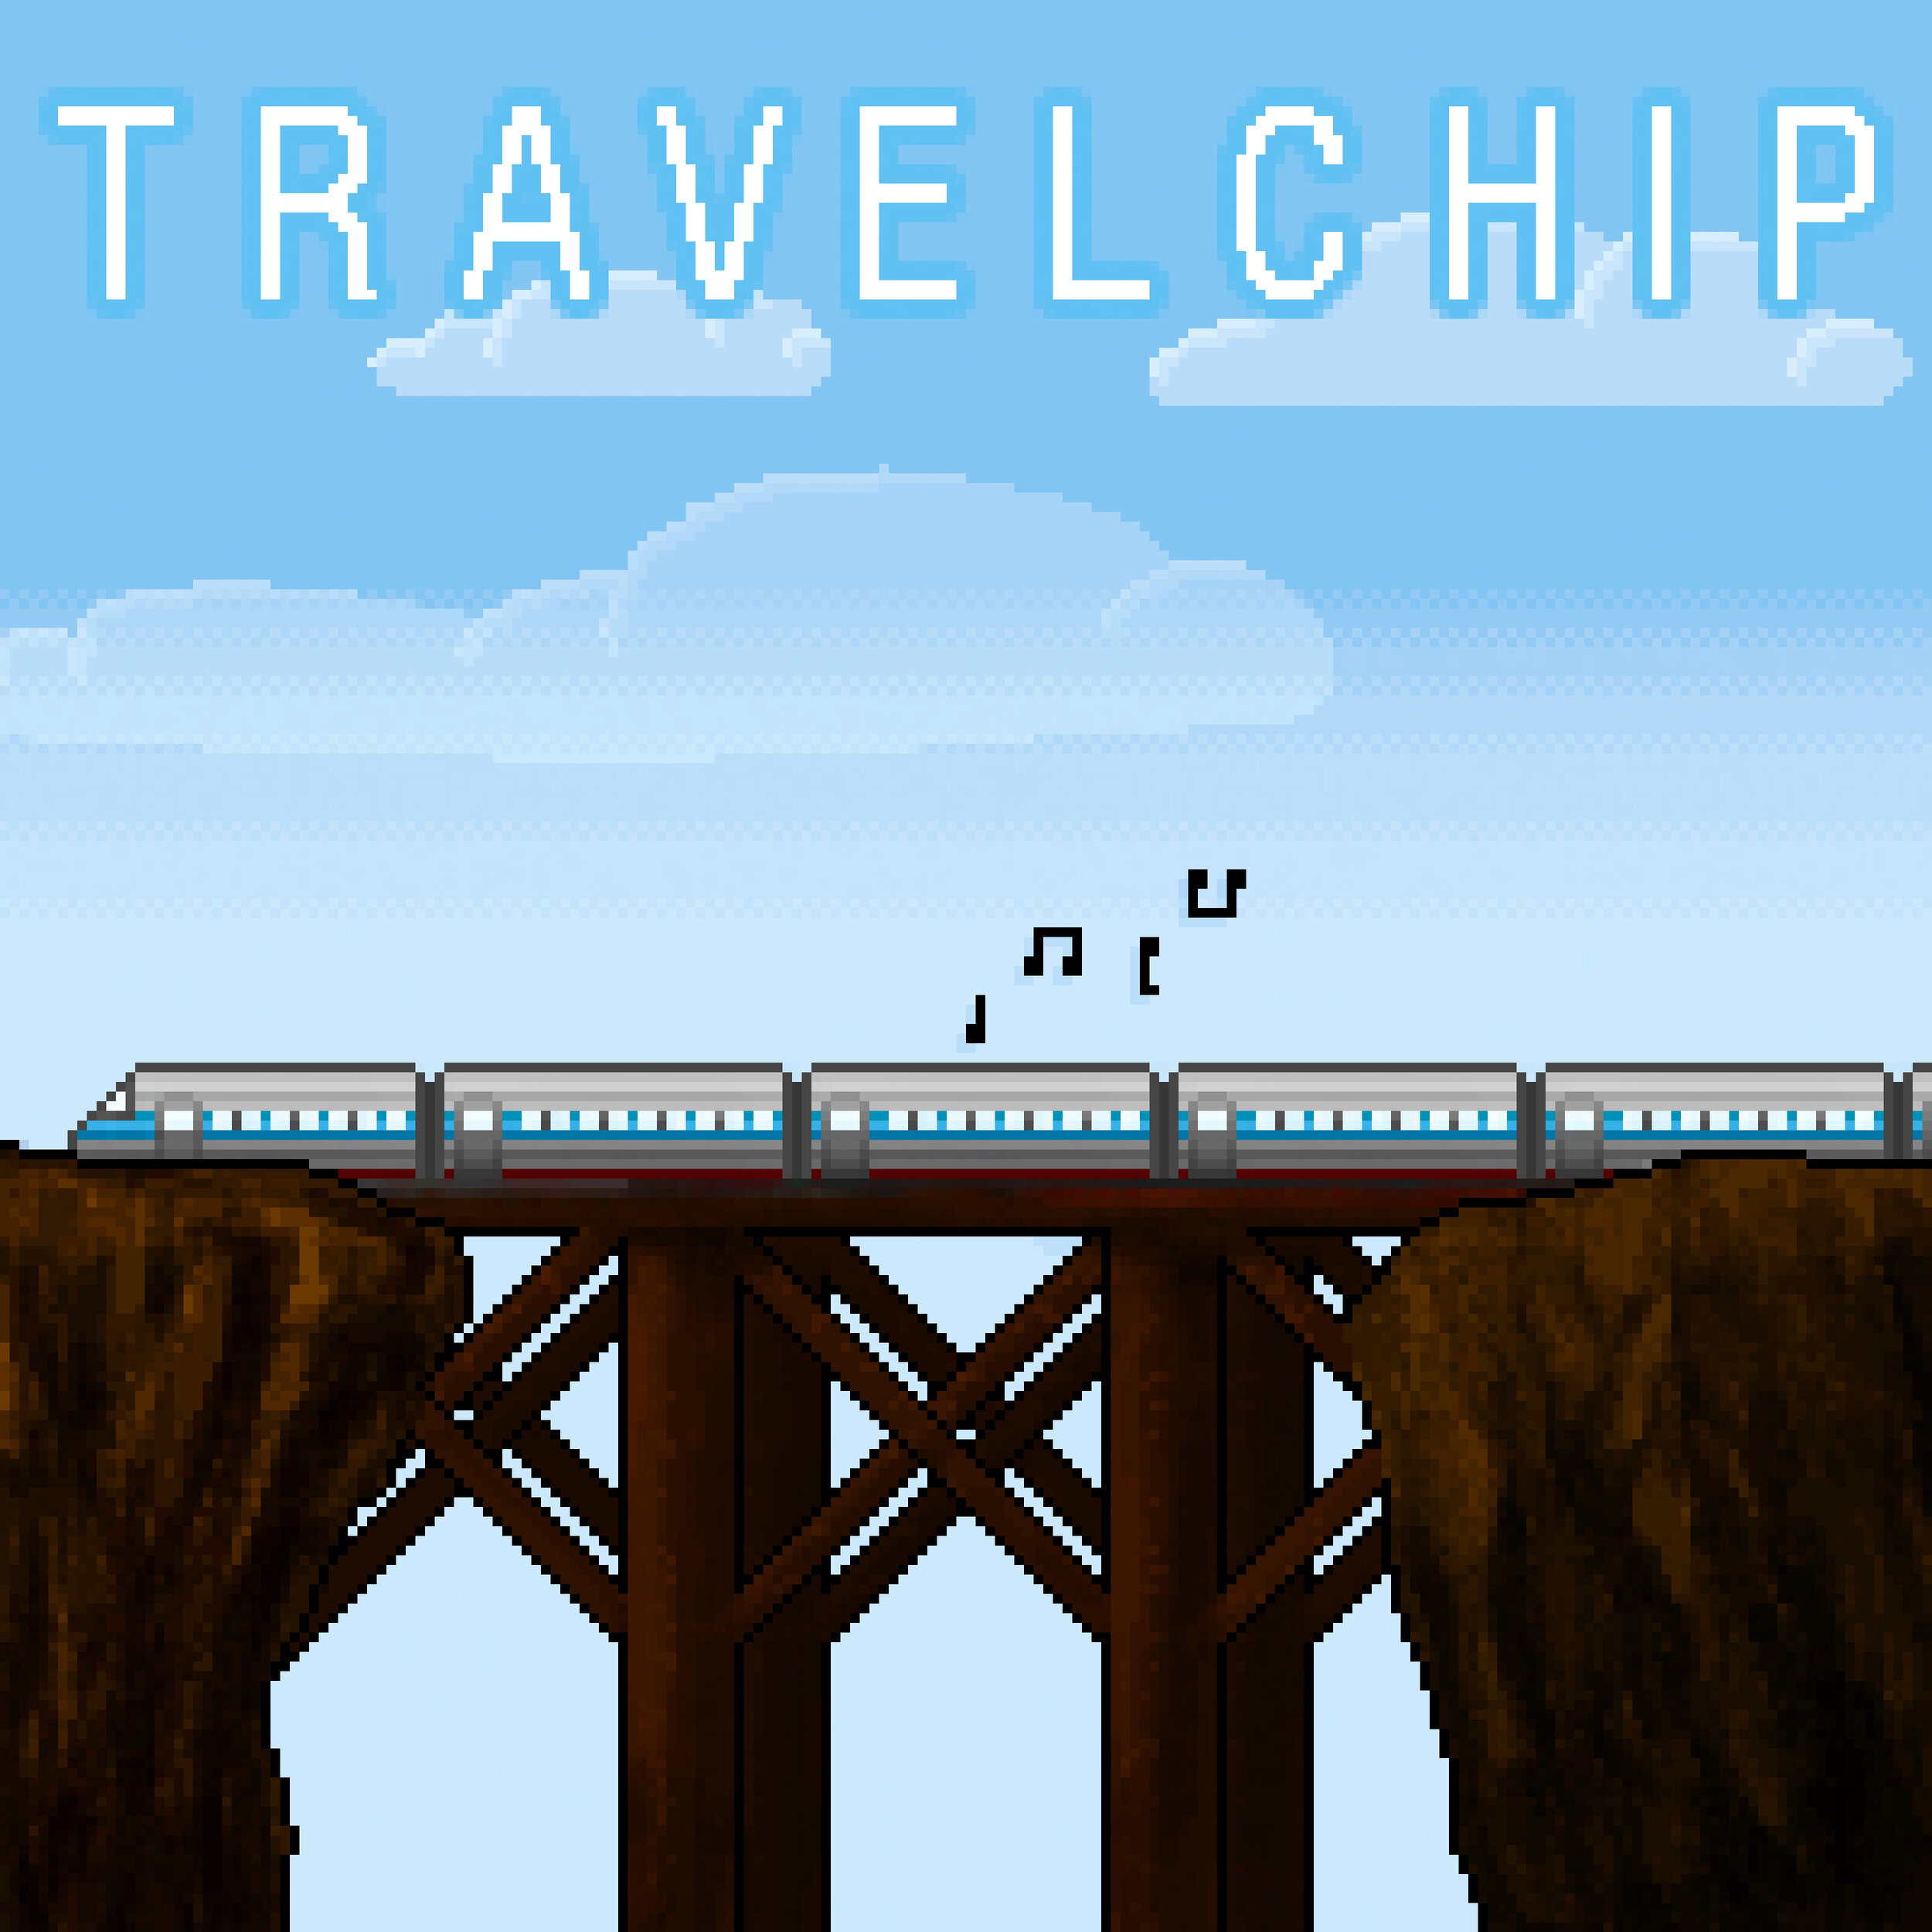 Travelchip - Full Length Album / Chiptune / Bitpop / ElectronicReleased on Lagom Audio/VisualStreaming on Spotify